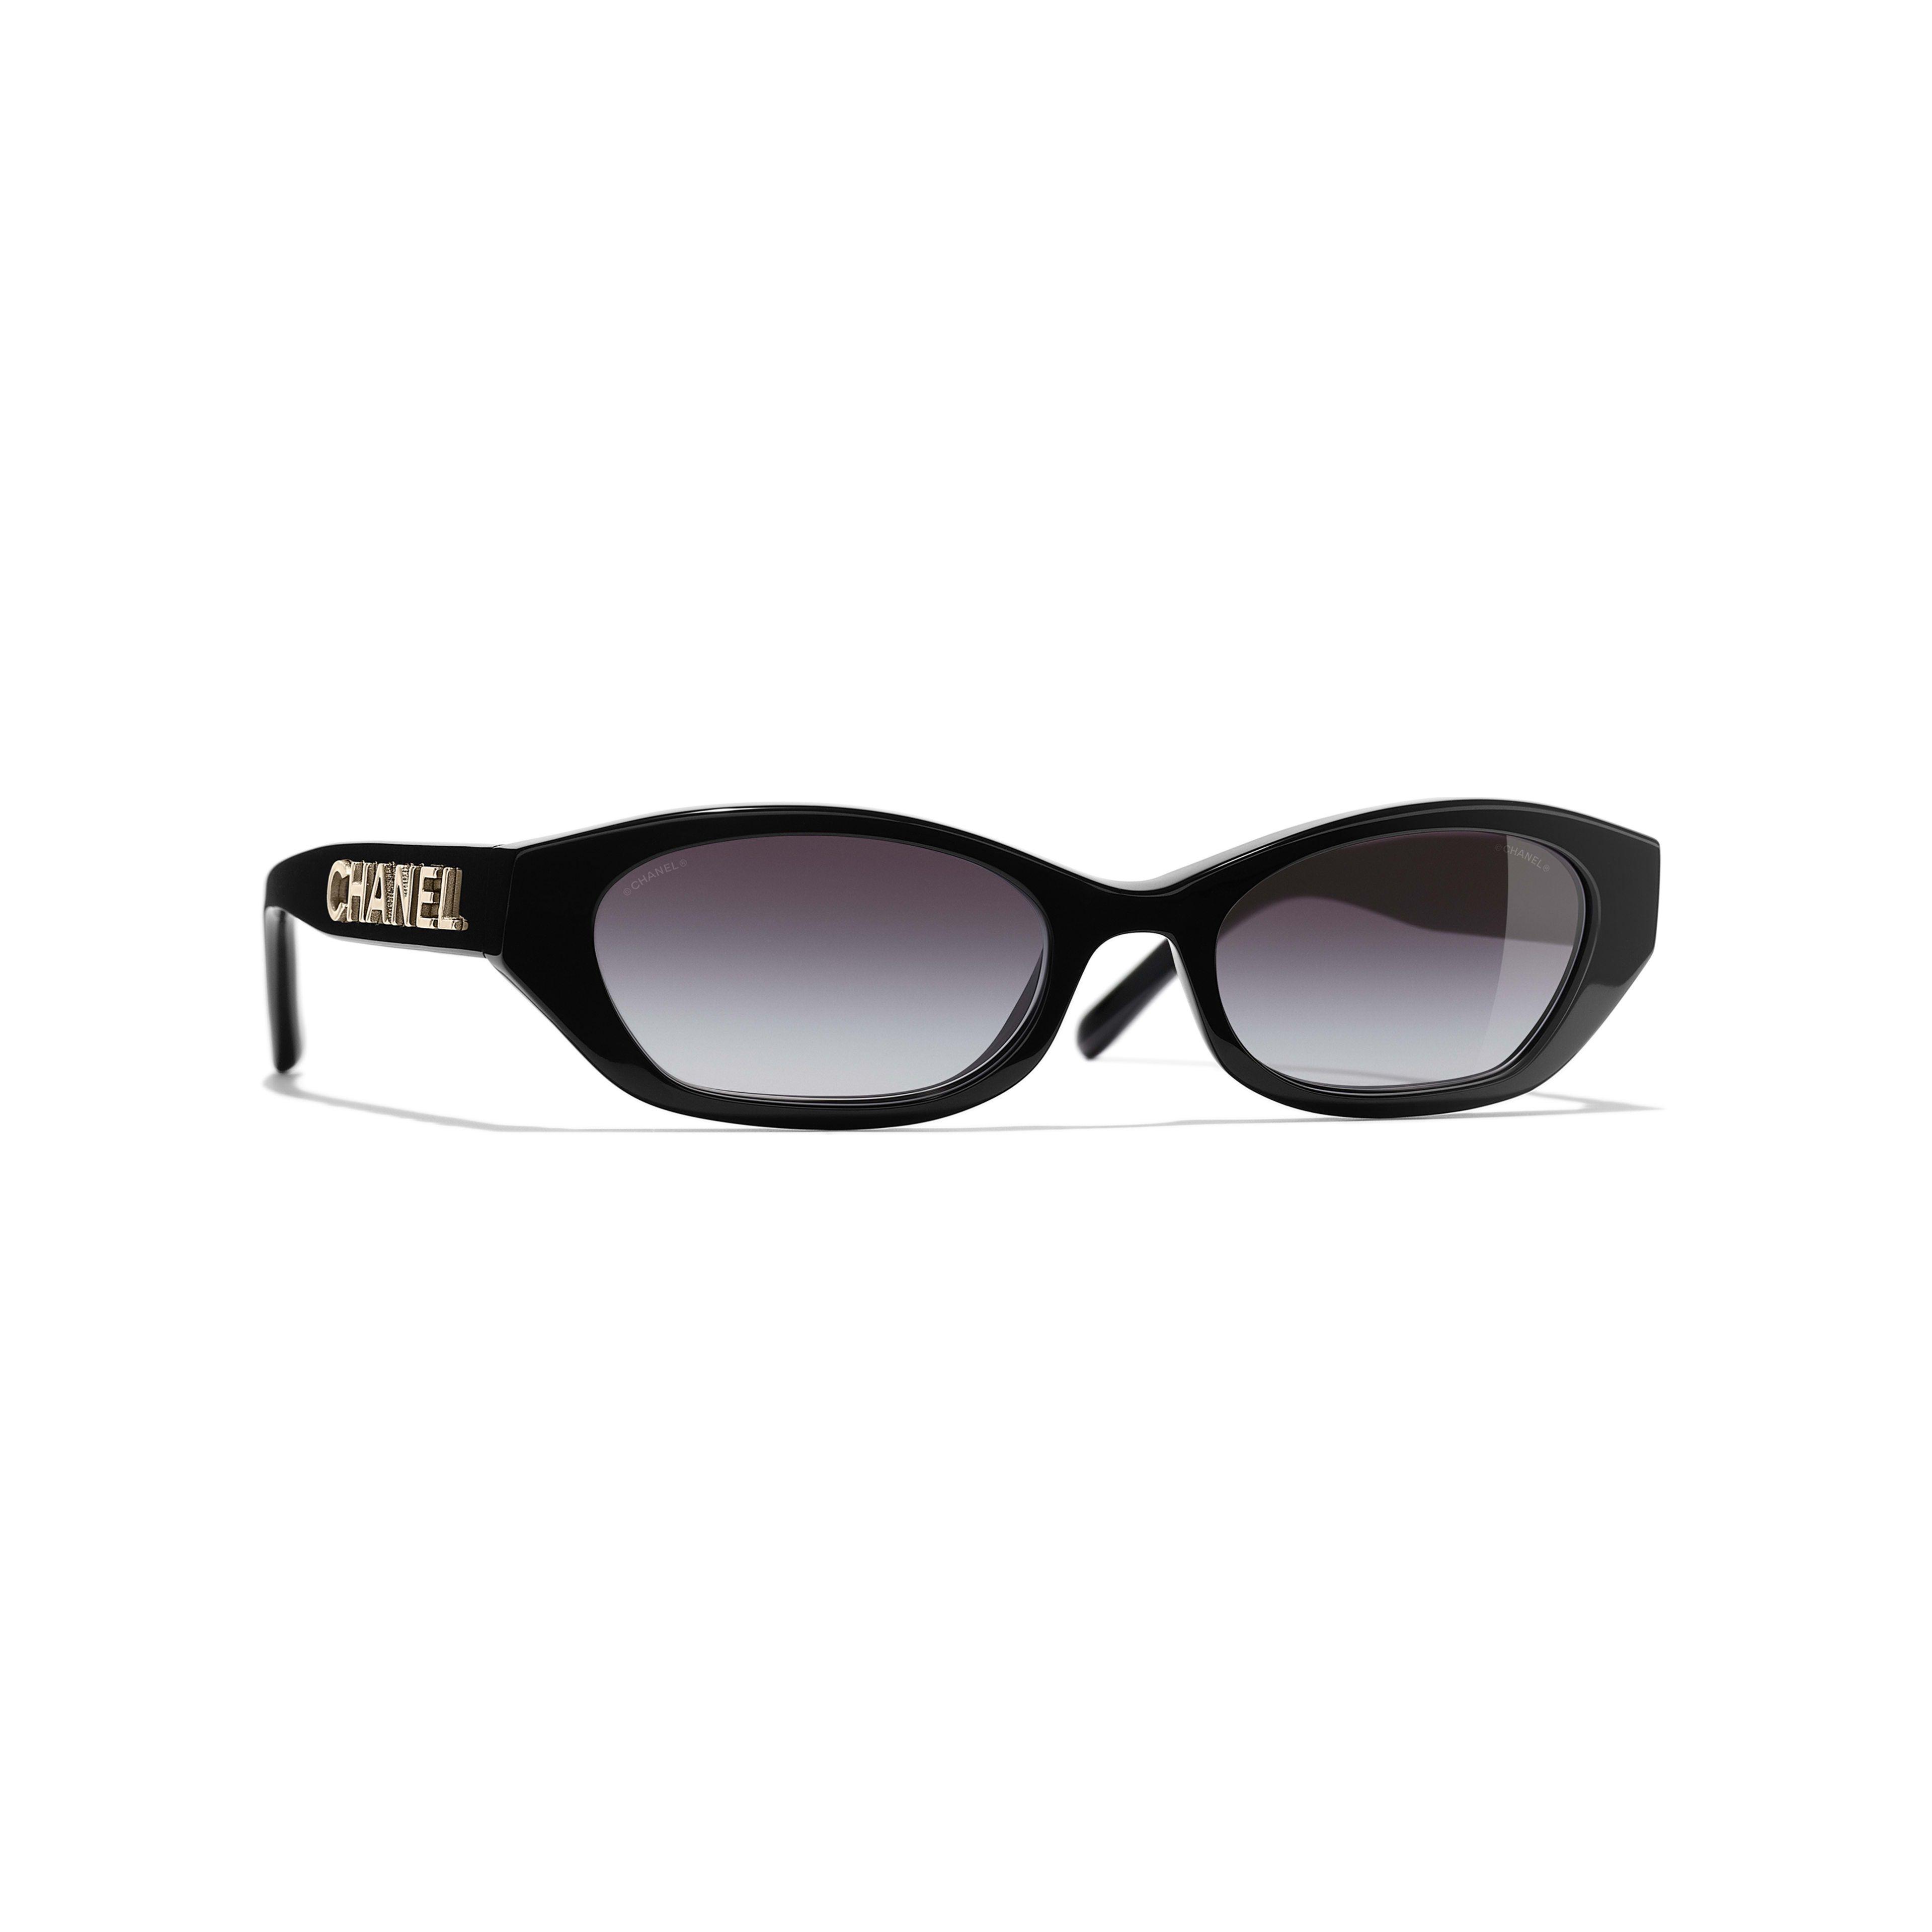 b6c58347e Rectangle Sunglasses - Black - Acetate - Default view - see full sized  version